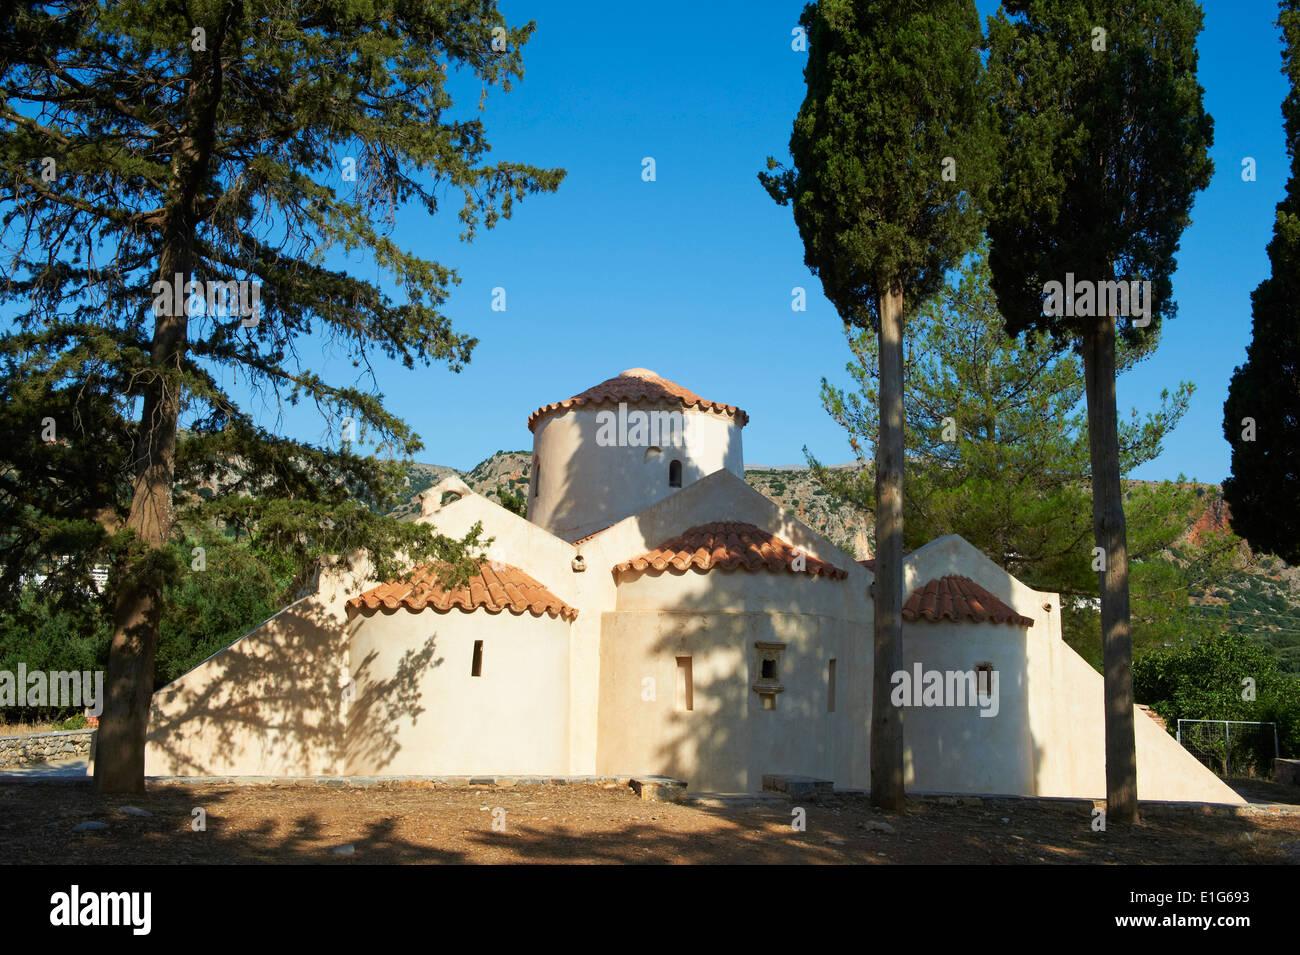 Greece, Crete island, Panagia Kera church at Krista near Aghios Nikolaos - Stock Image